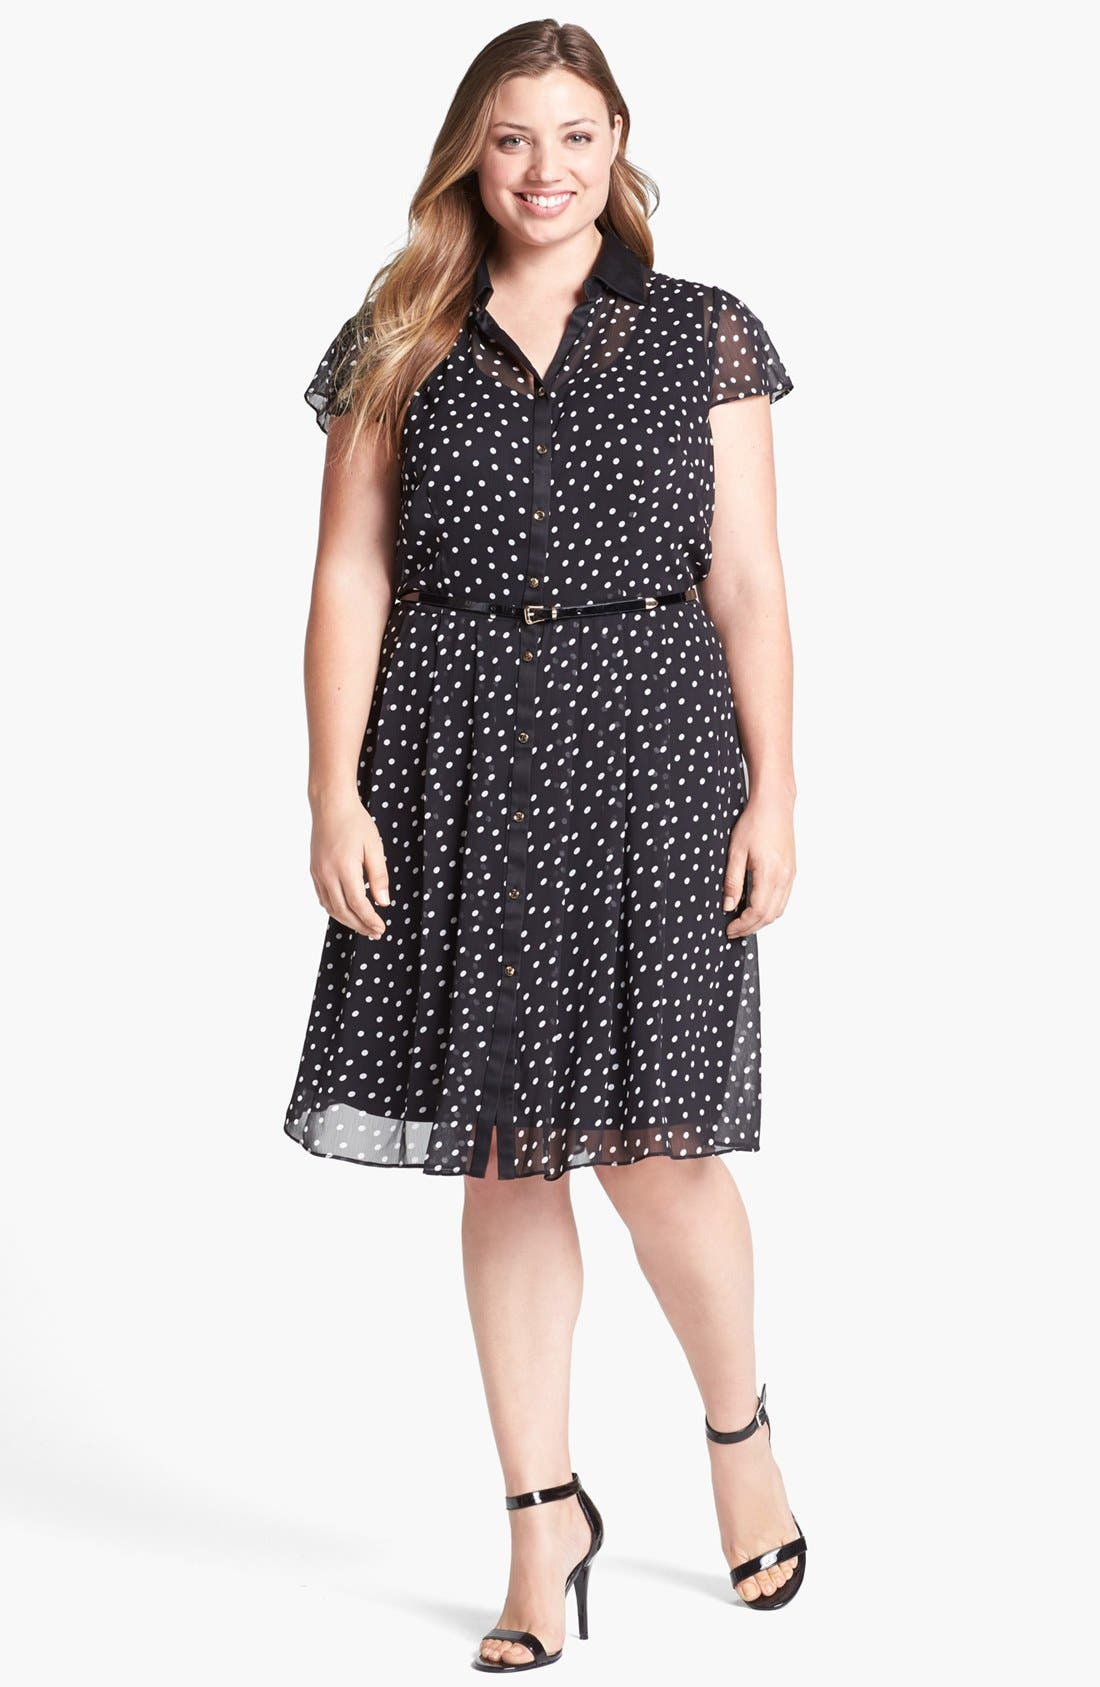 Main Image - Donna Ricco Polka Dot Chiffon Shirtdress (Plus Size)